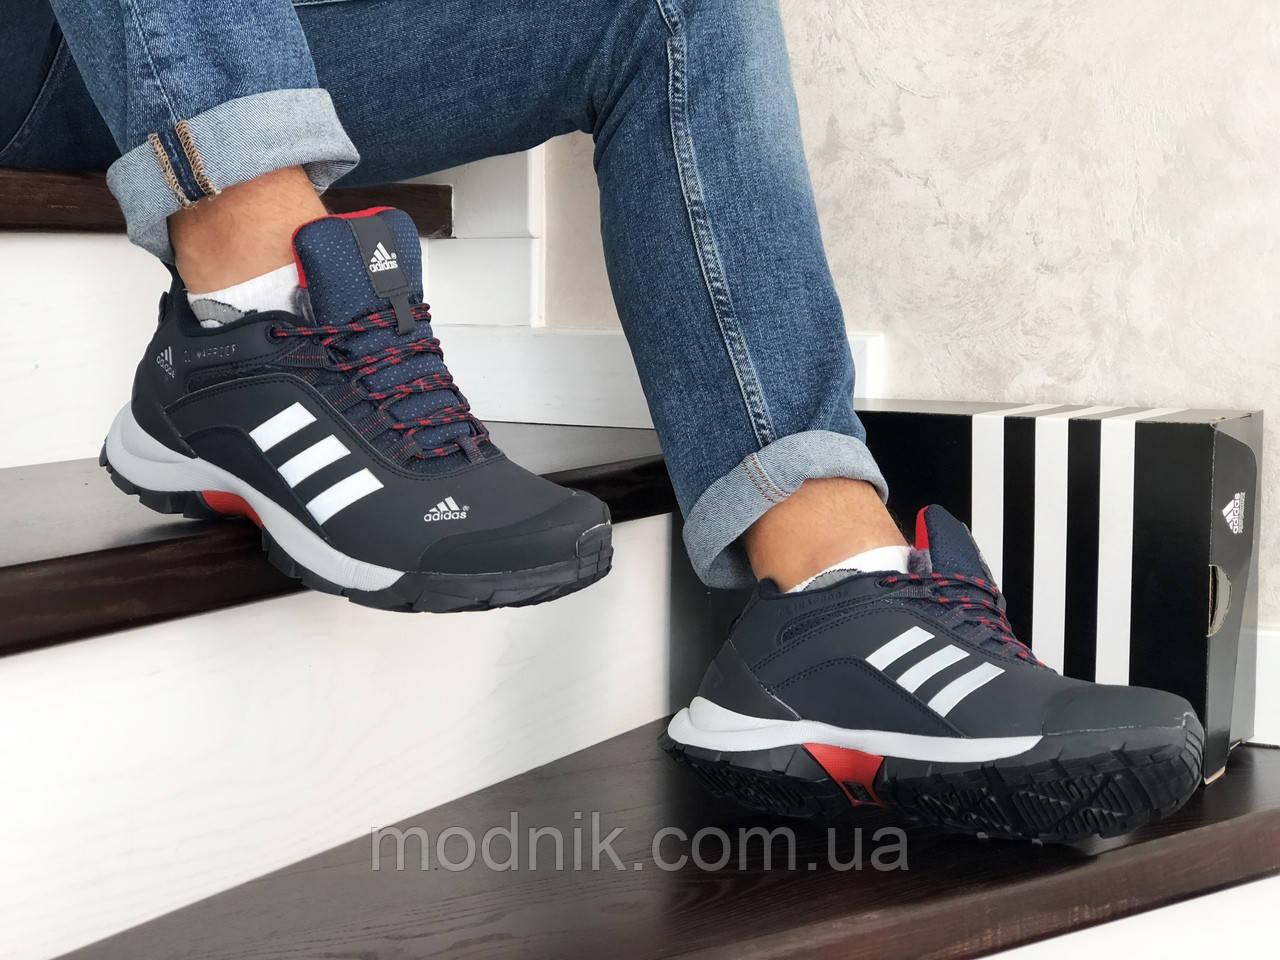 Мужские зимние кроссовки Adidas Climaproof (темно-синие с белым)